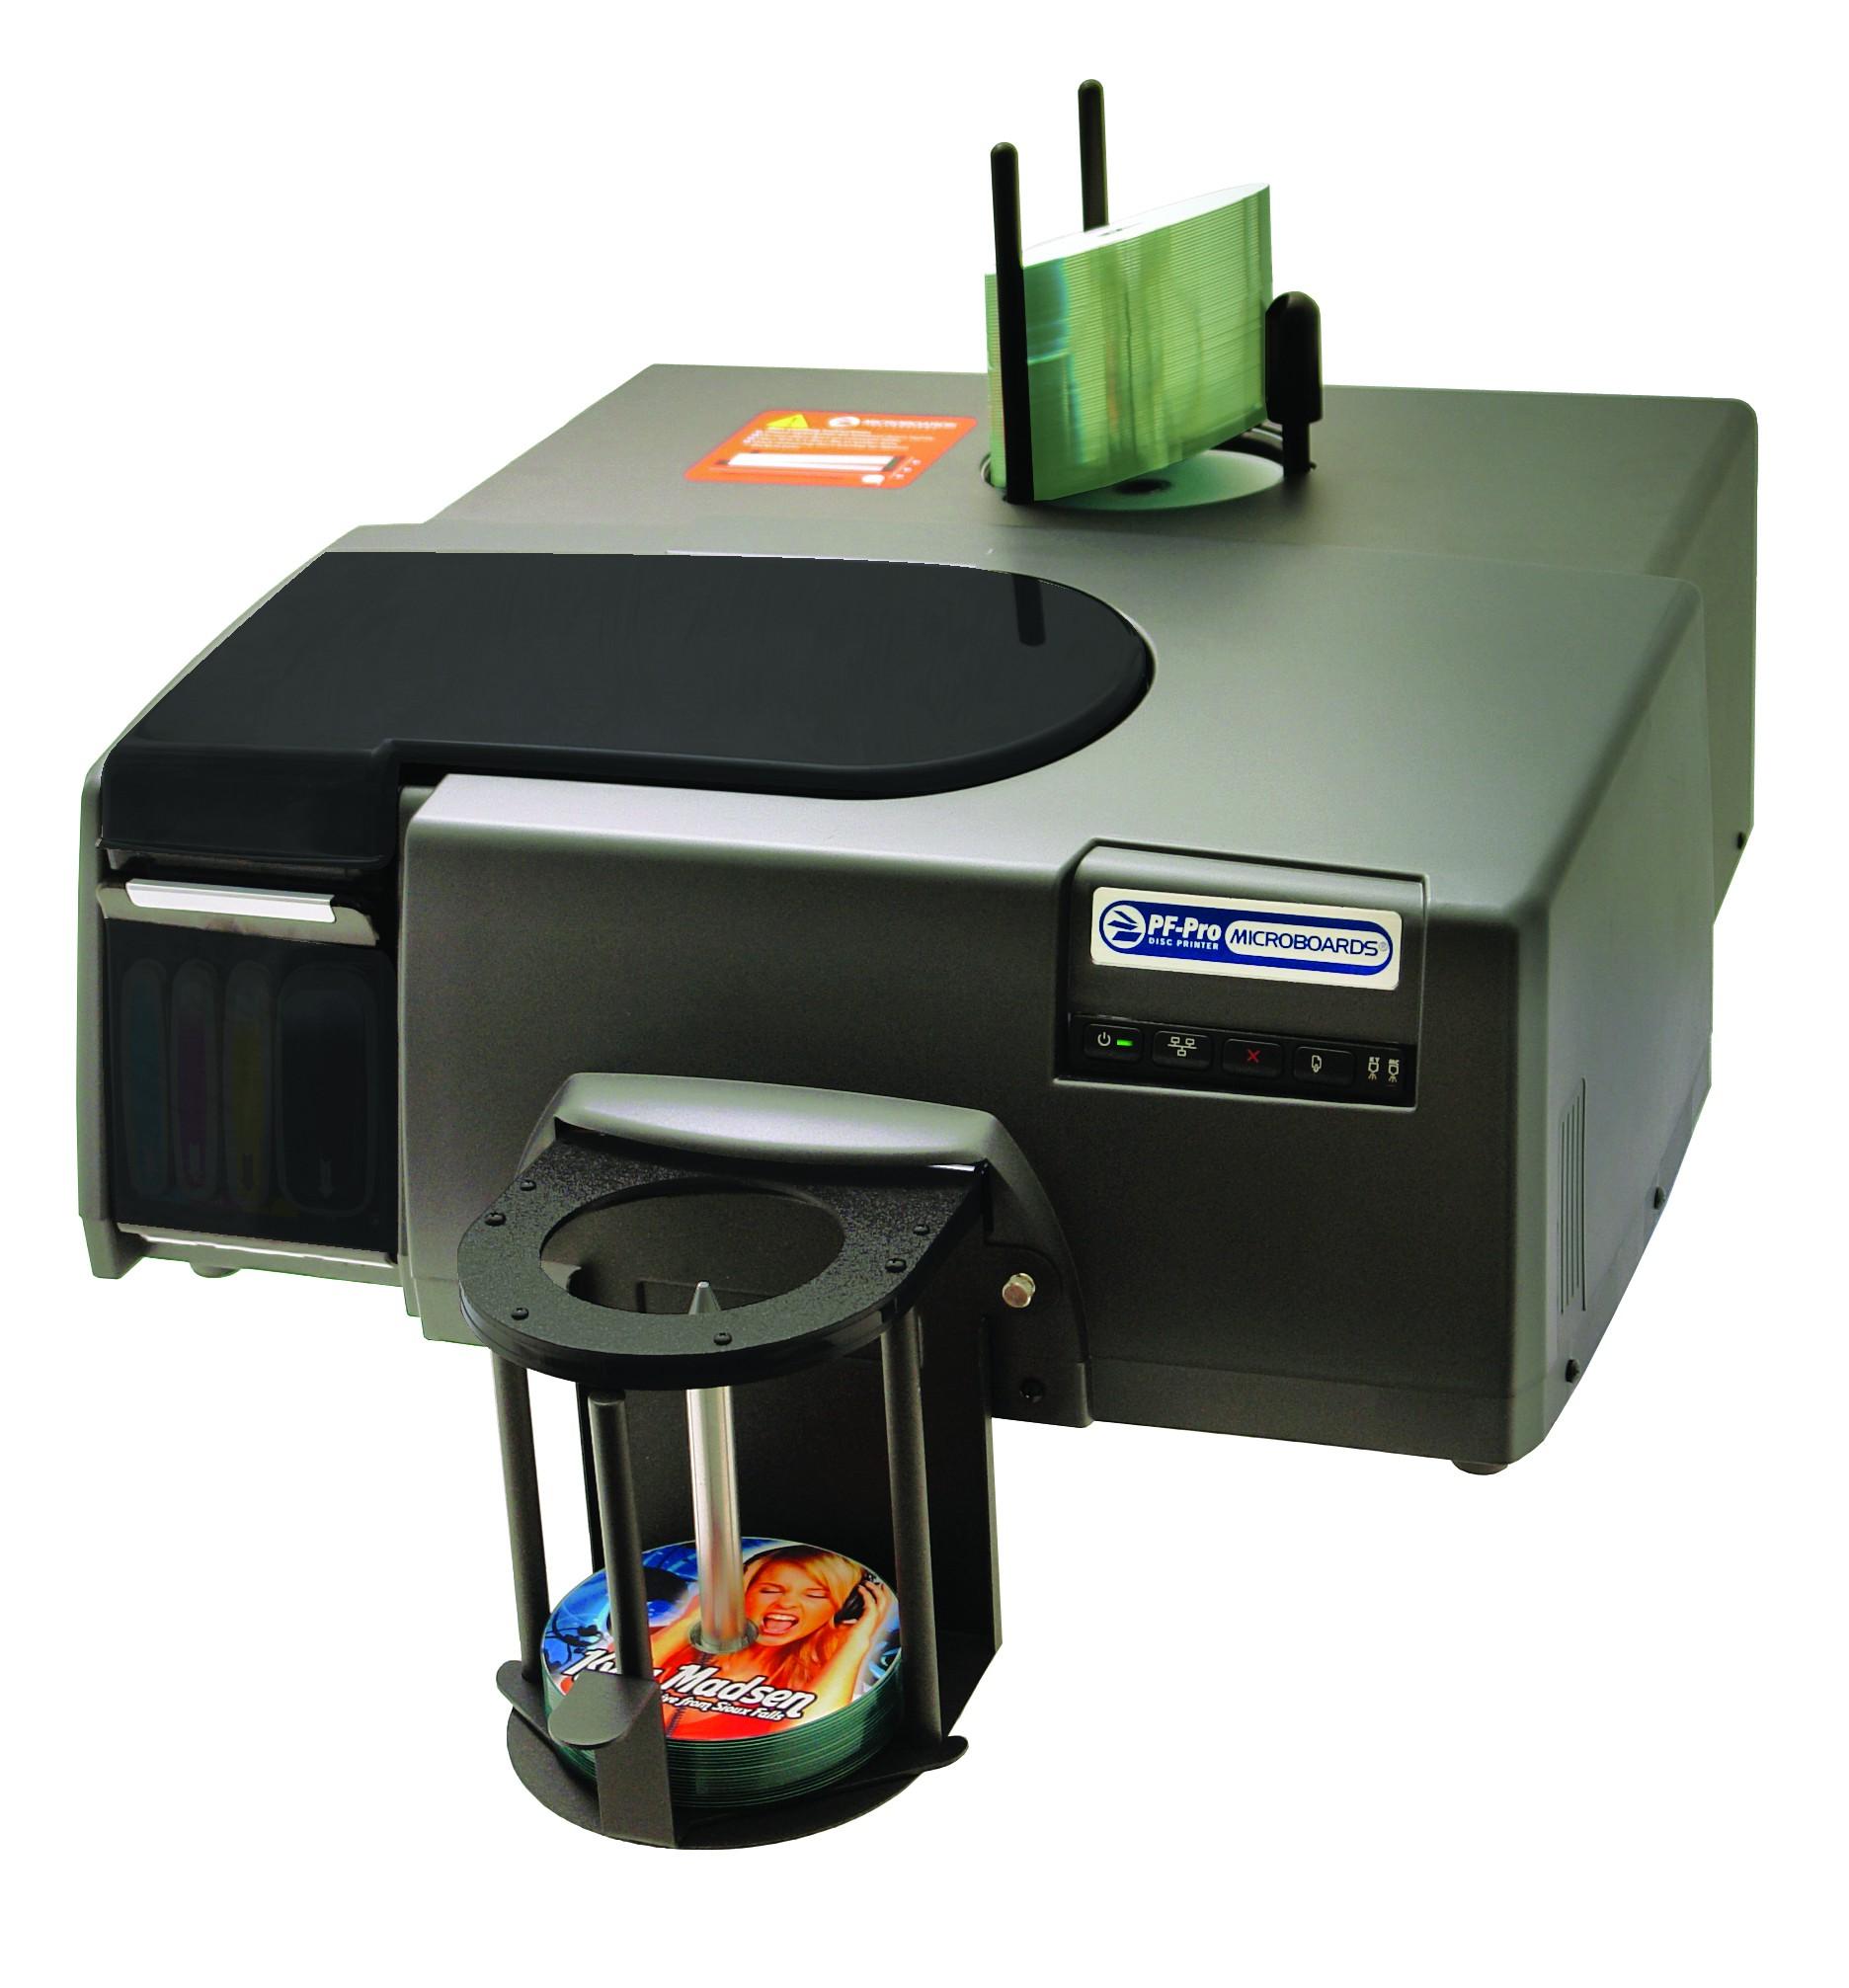 Microboards PF Pro CD/DVD Printer